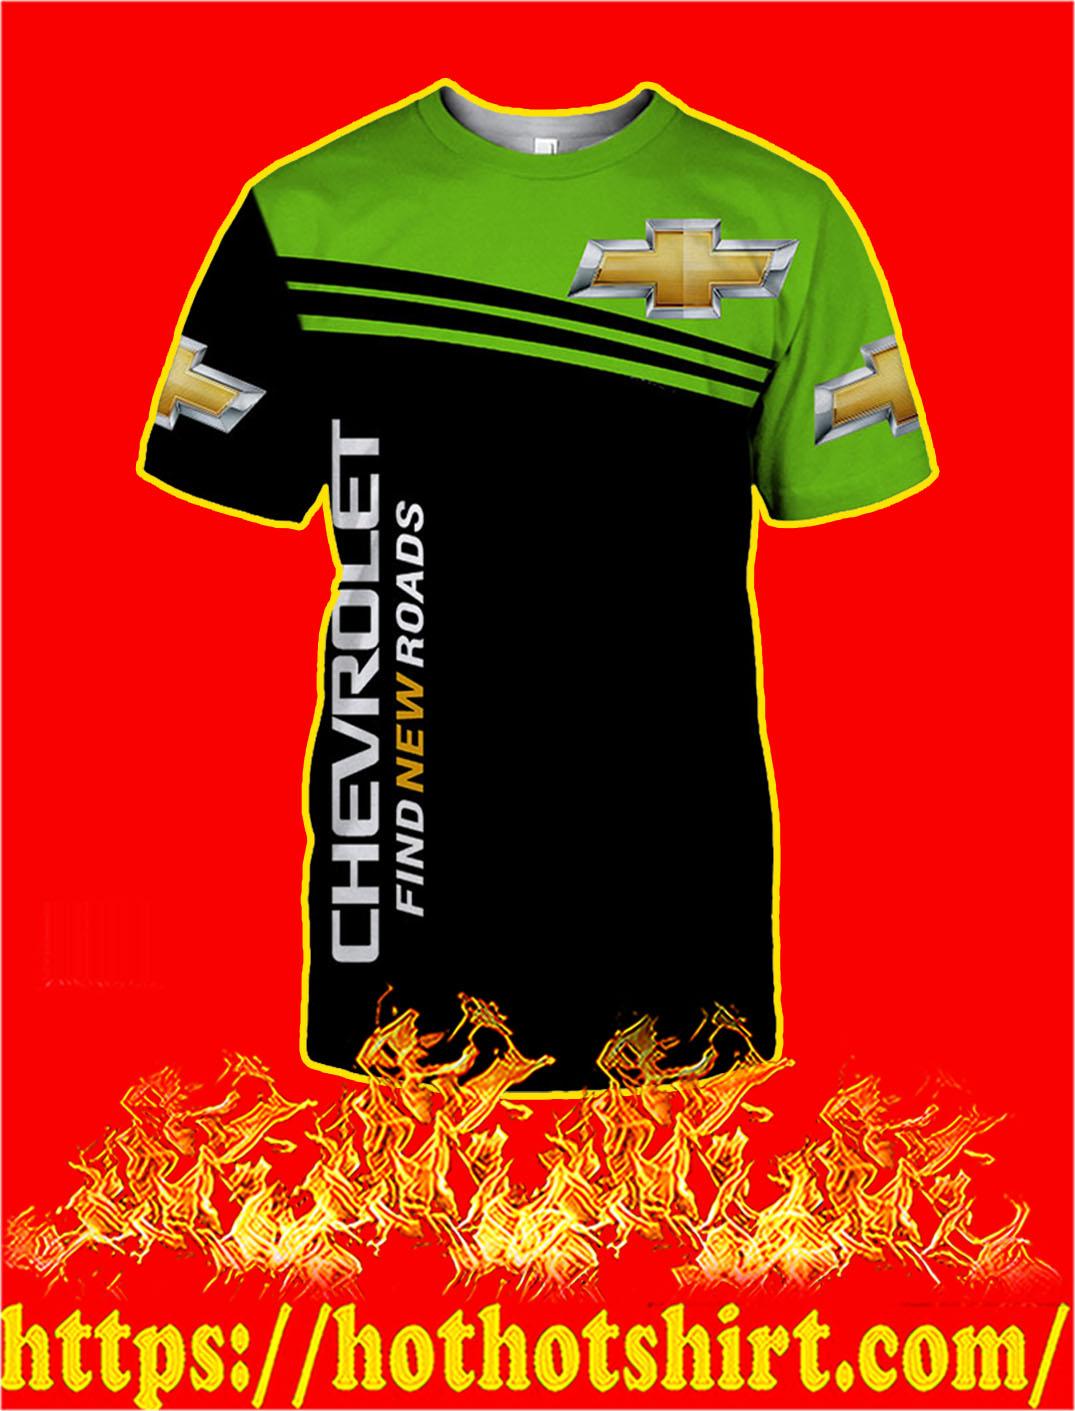 Chevrolet Find New Roads 3D T-shirt